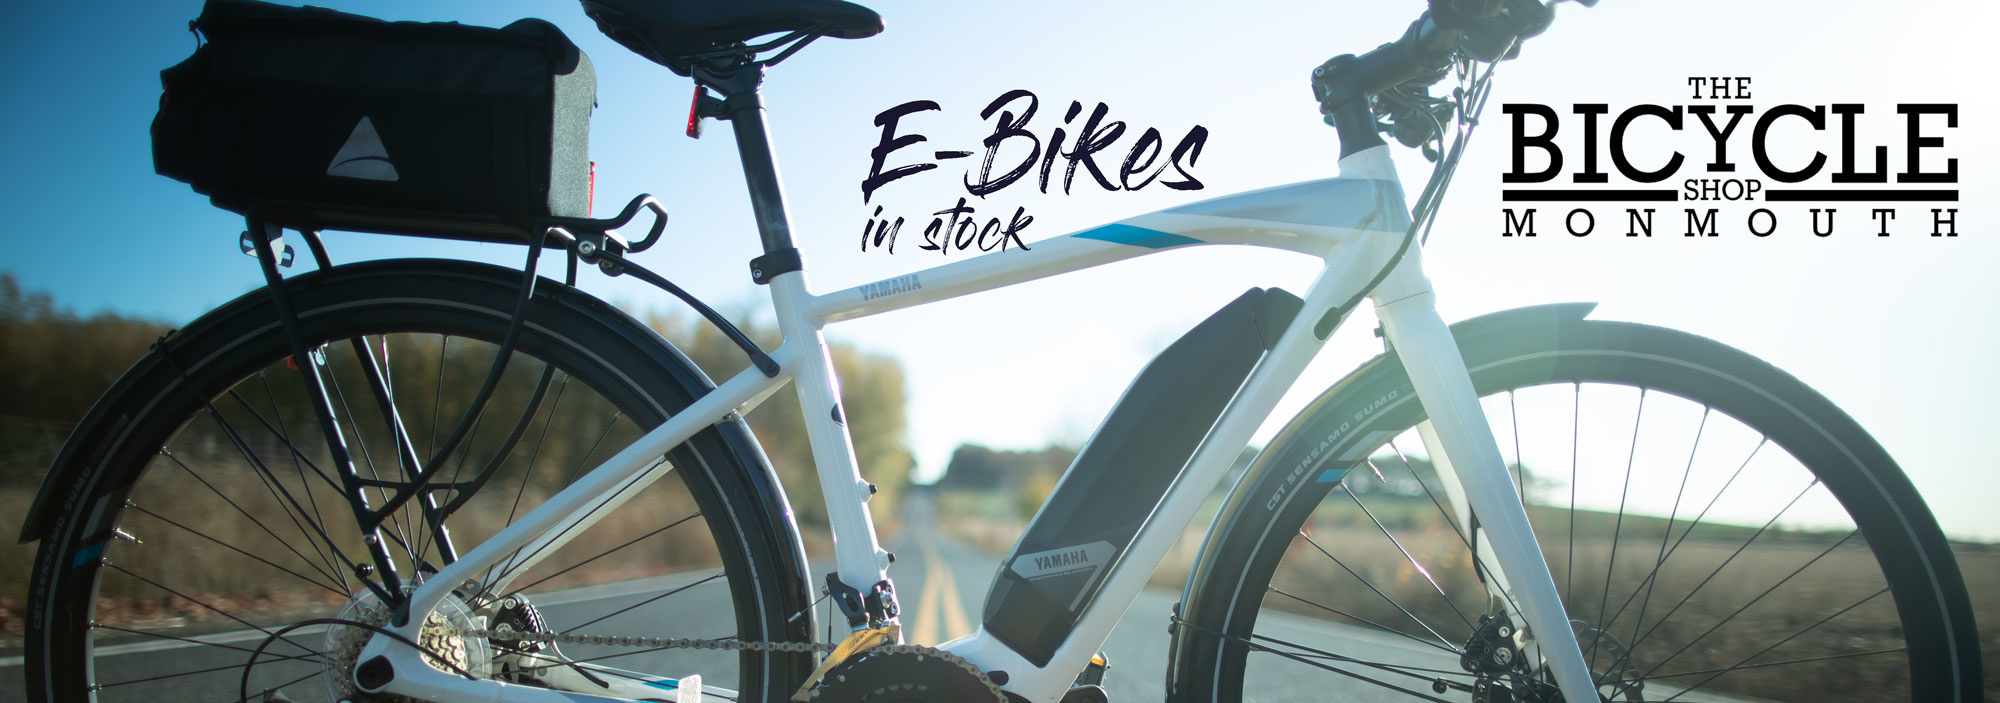 E-bikes in Stock!